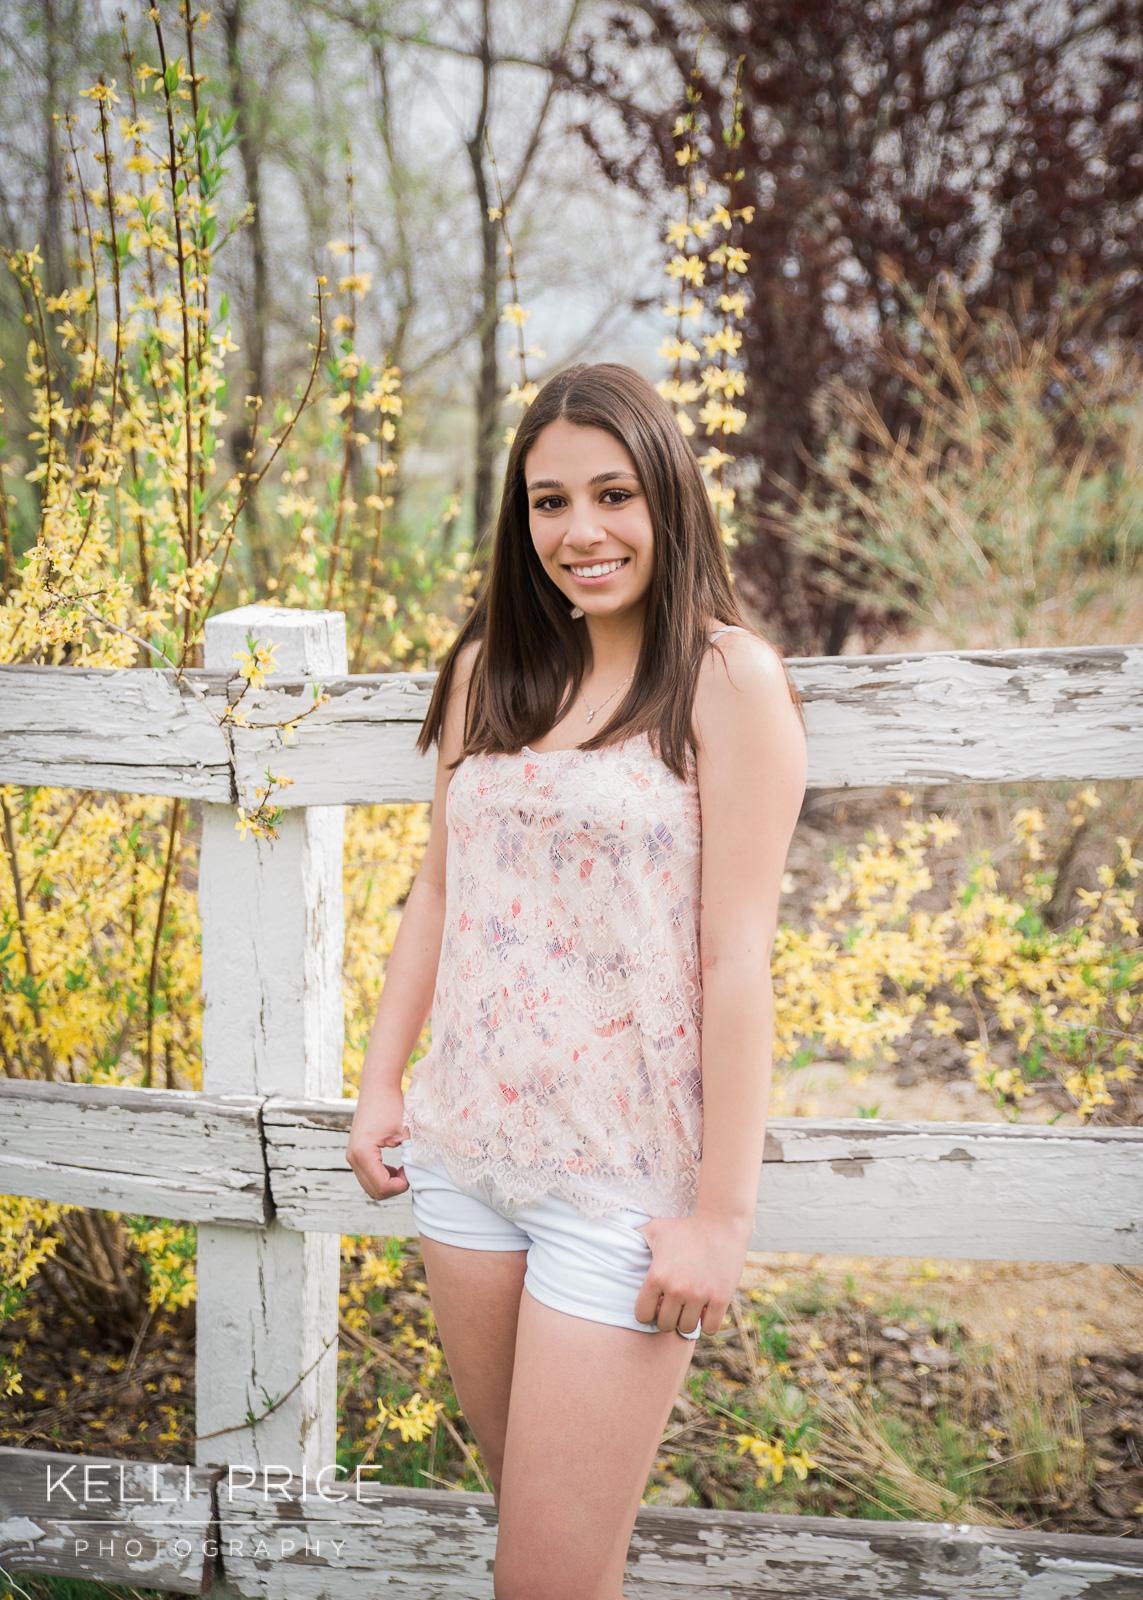 MadisonSeniorPortraits19_KelliPricePhotography_RenoNevadaApril2016.jpg